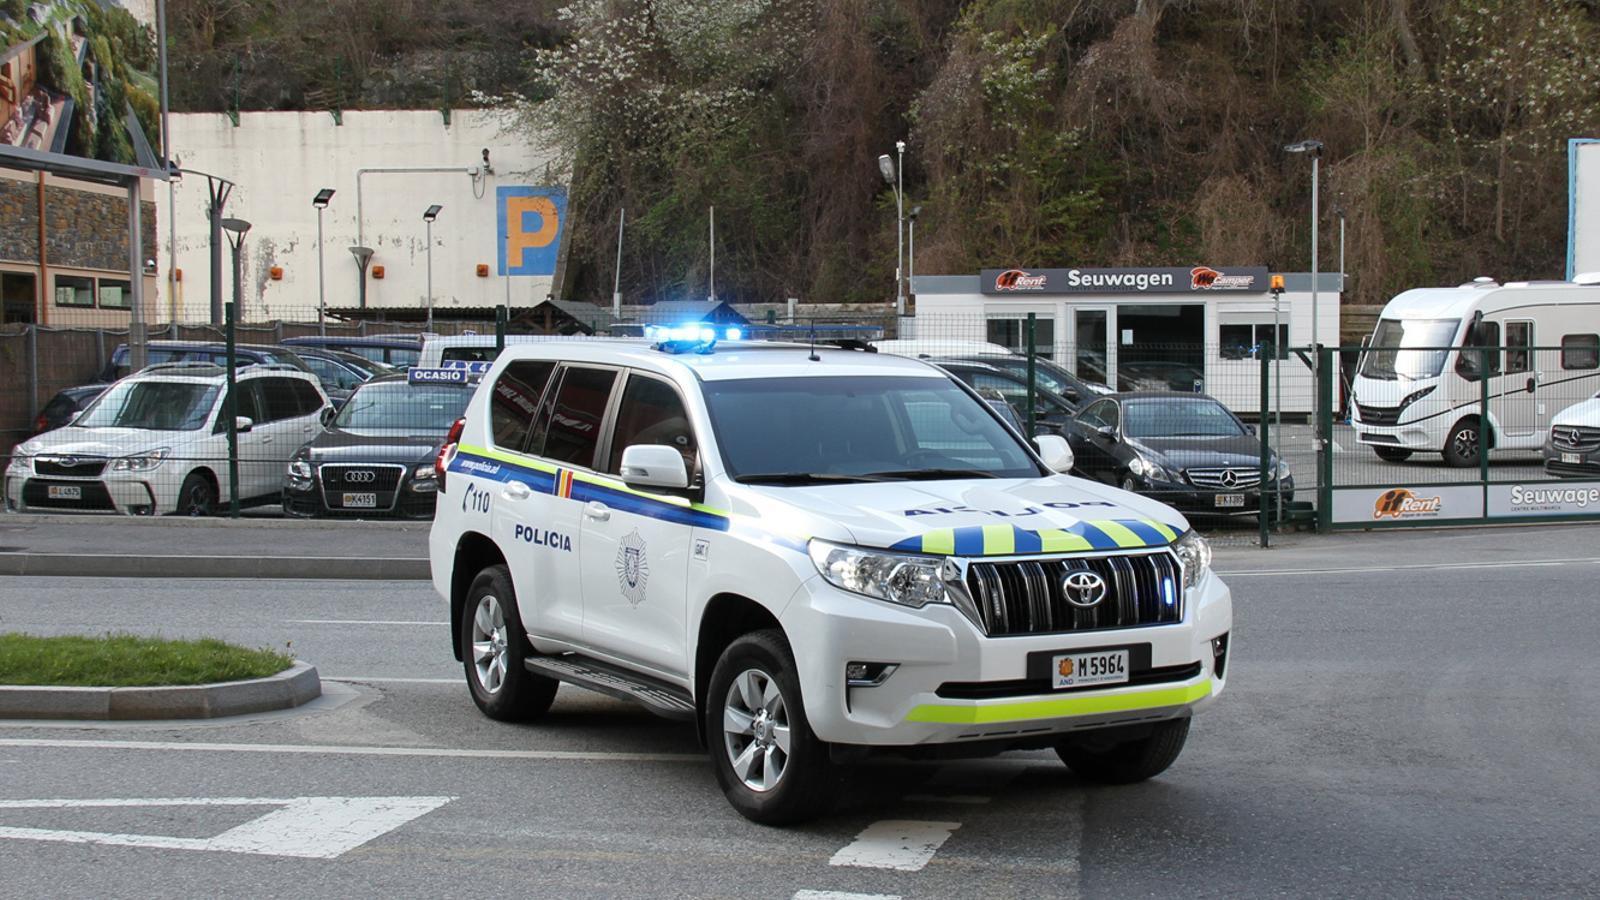 Un cotxe patrulla de la policia durant un control. / TWITTER POLICIA